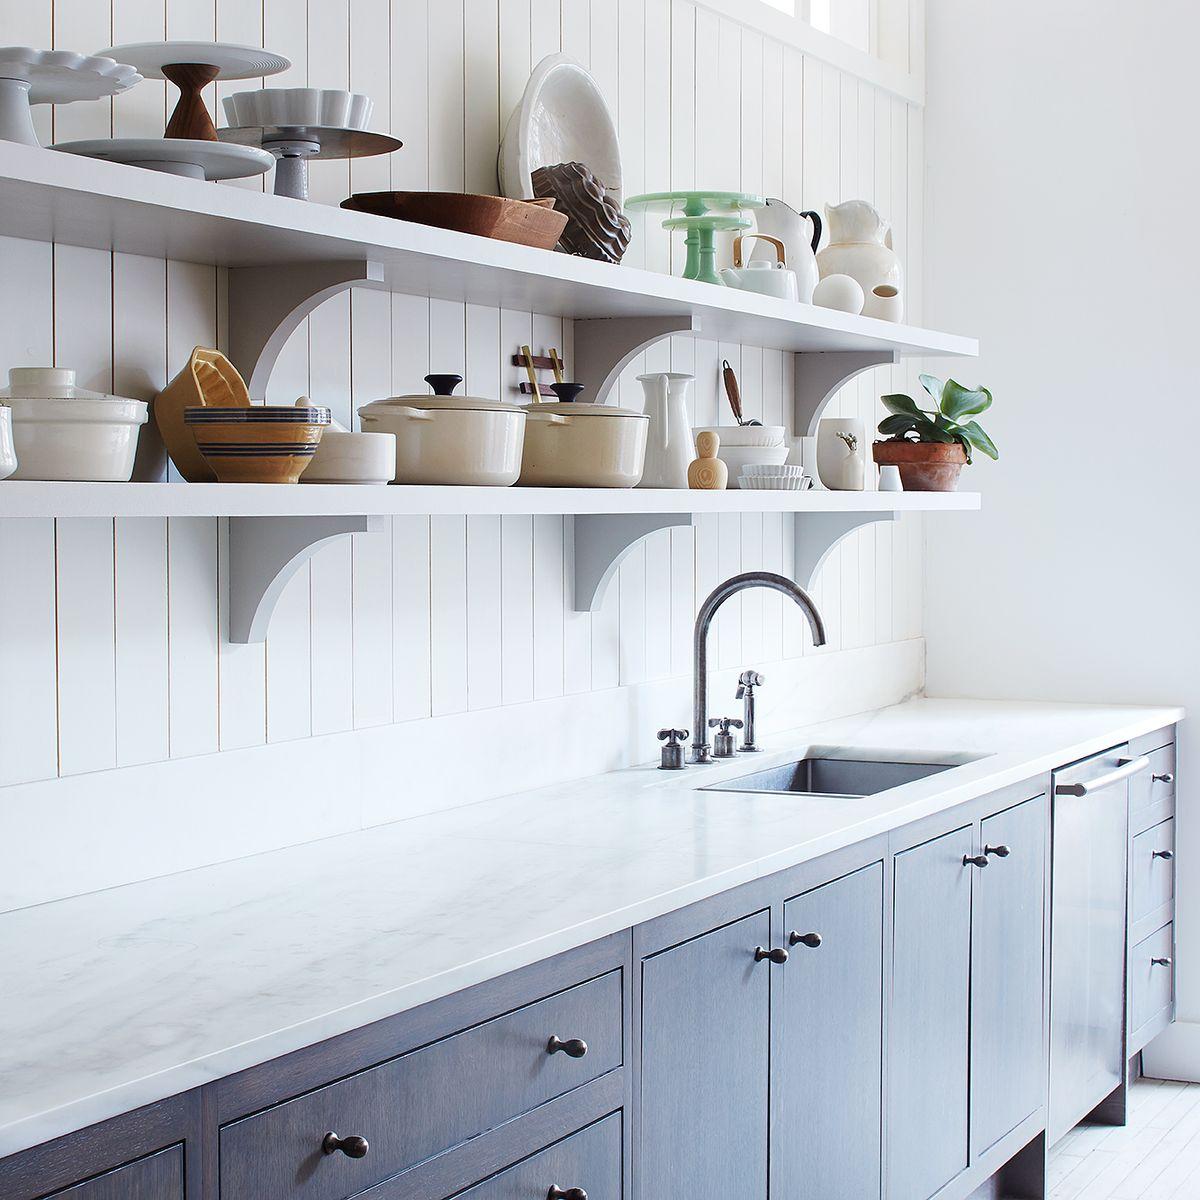 Help Me Not Mess Up My Kitchen Renovation